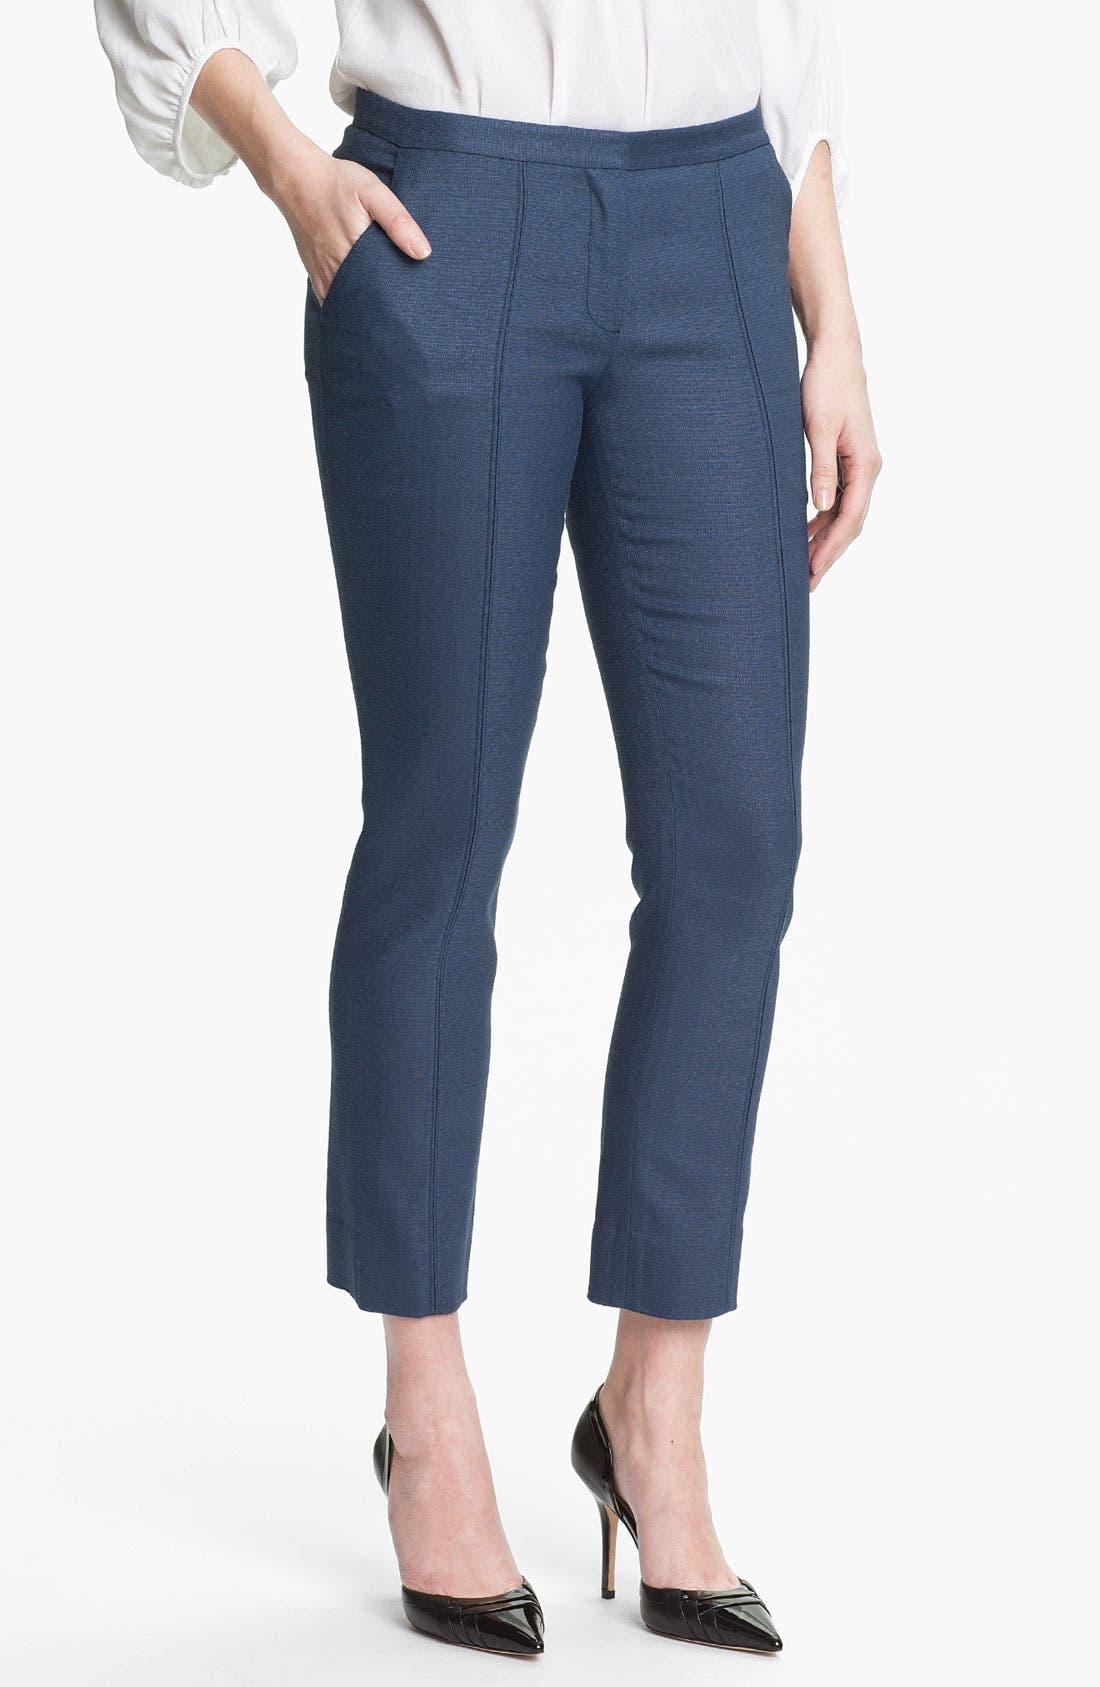 Alternate Image 1 Selected - Diane von Furstenberg 'Aislin' Crop Pants